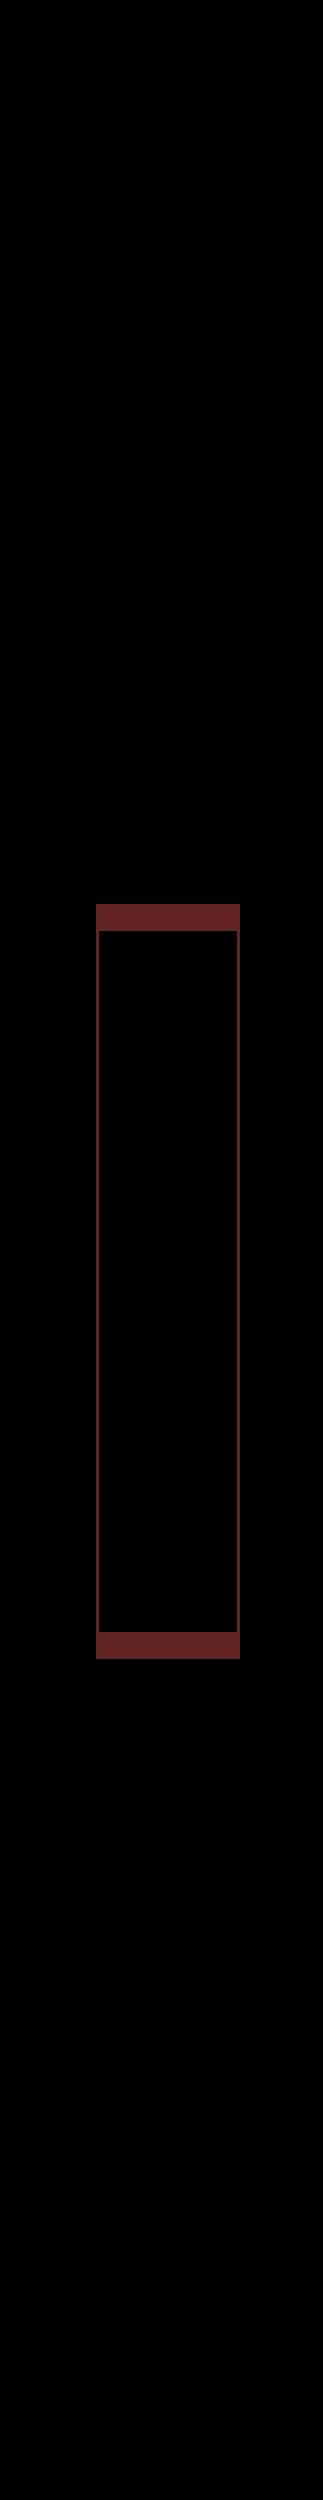 image?w=323&h=168&rev=274&ac=1